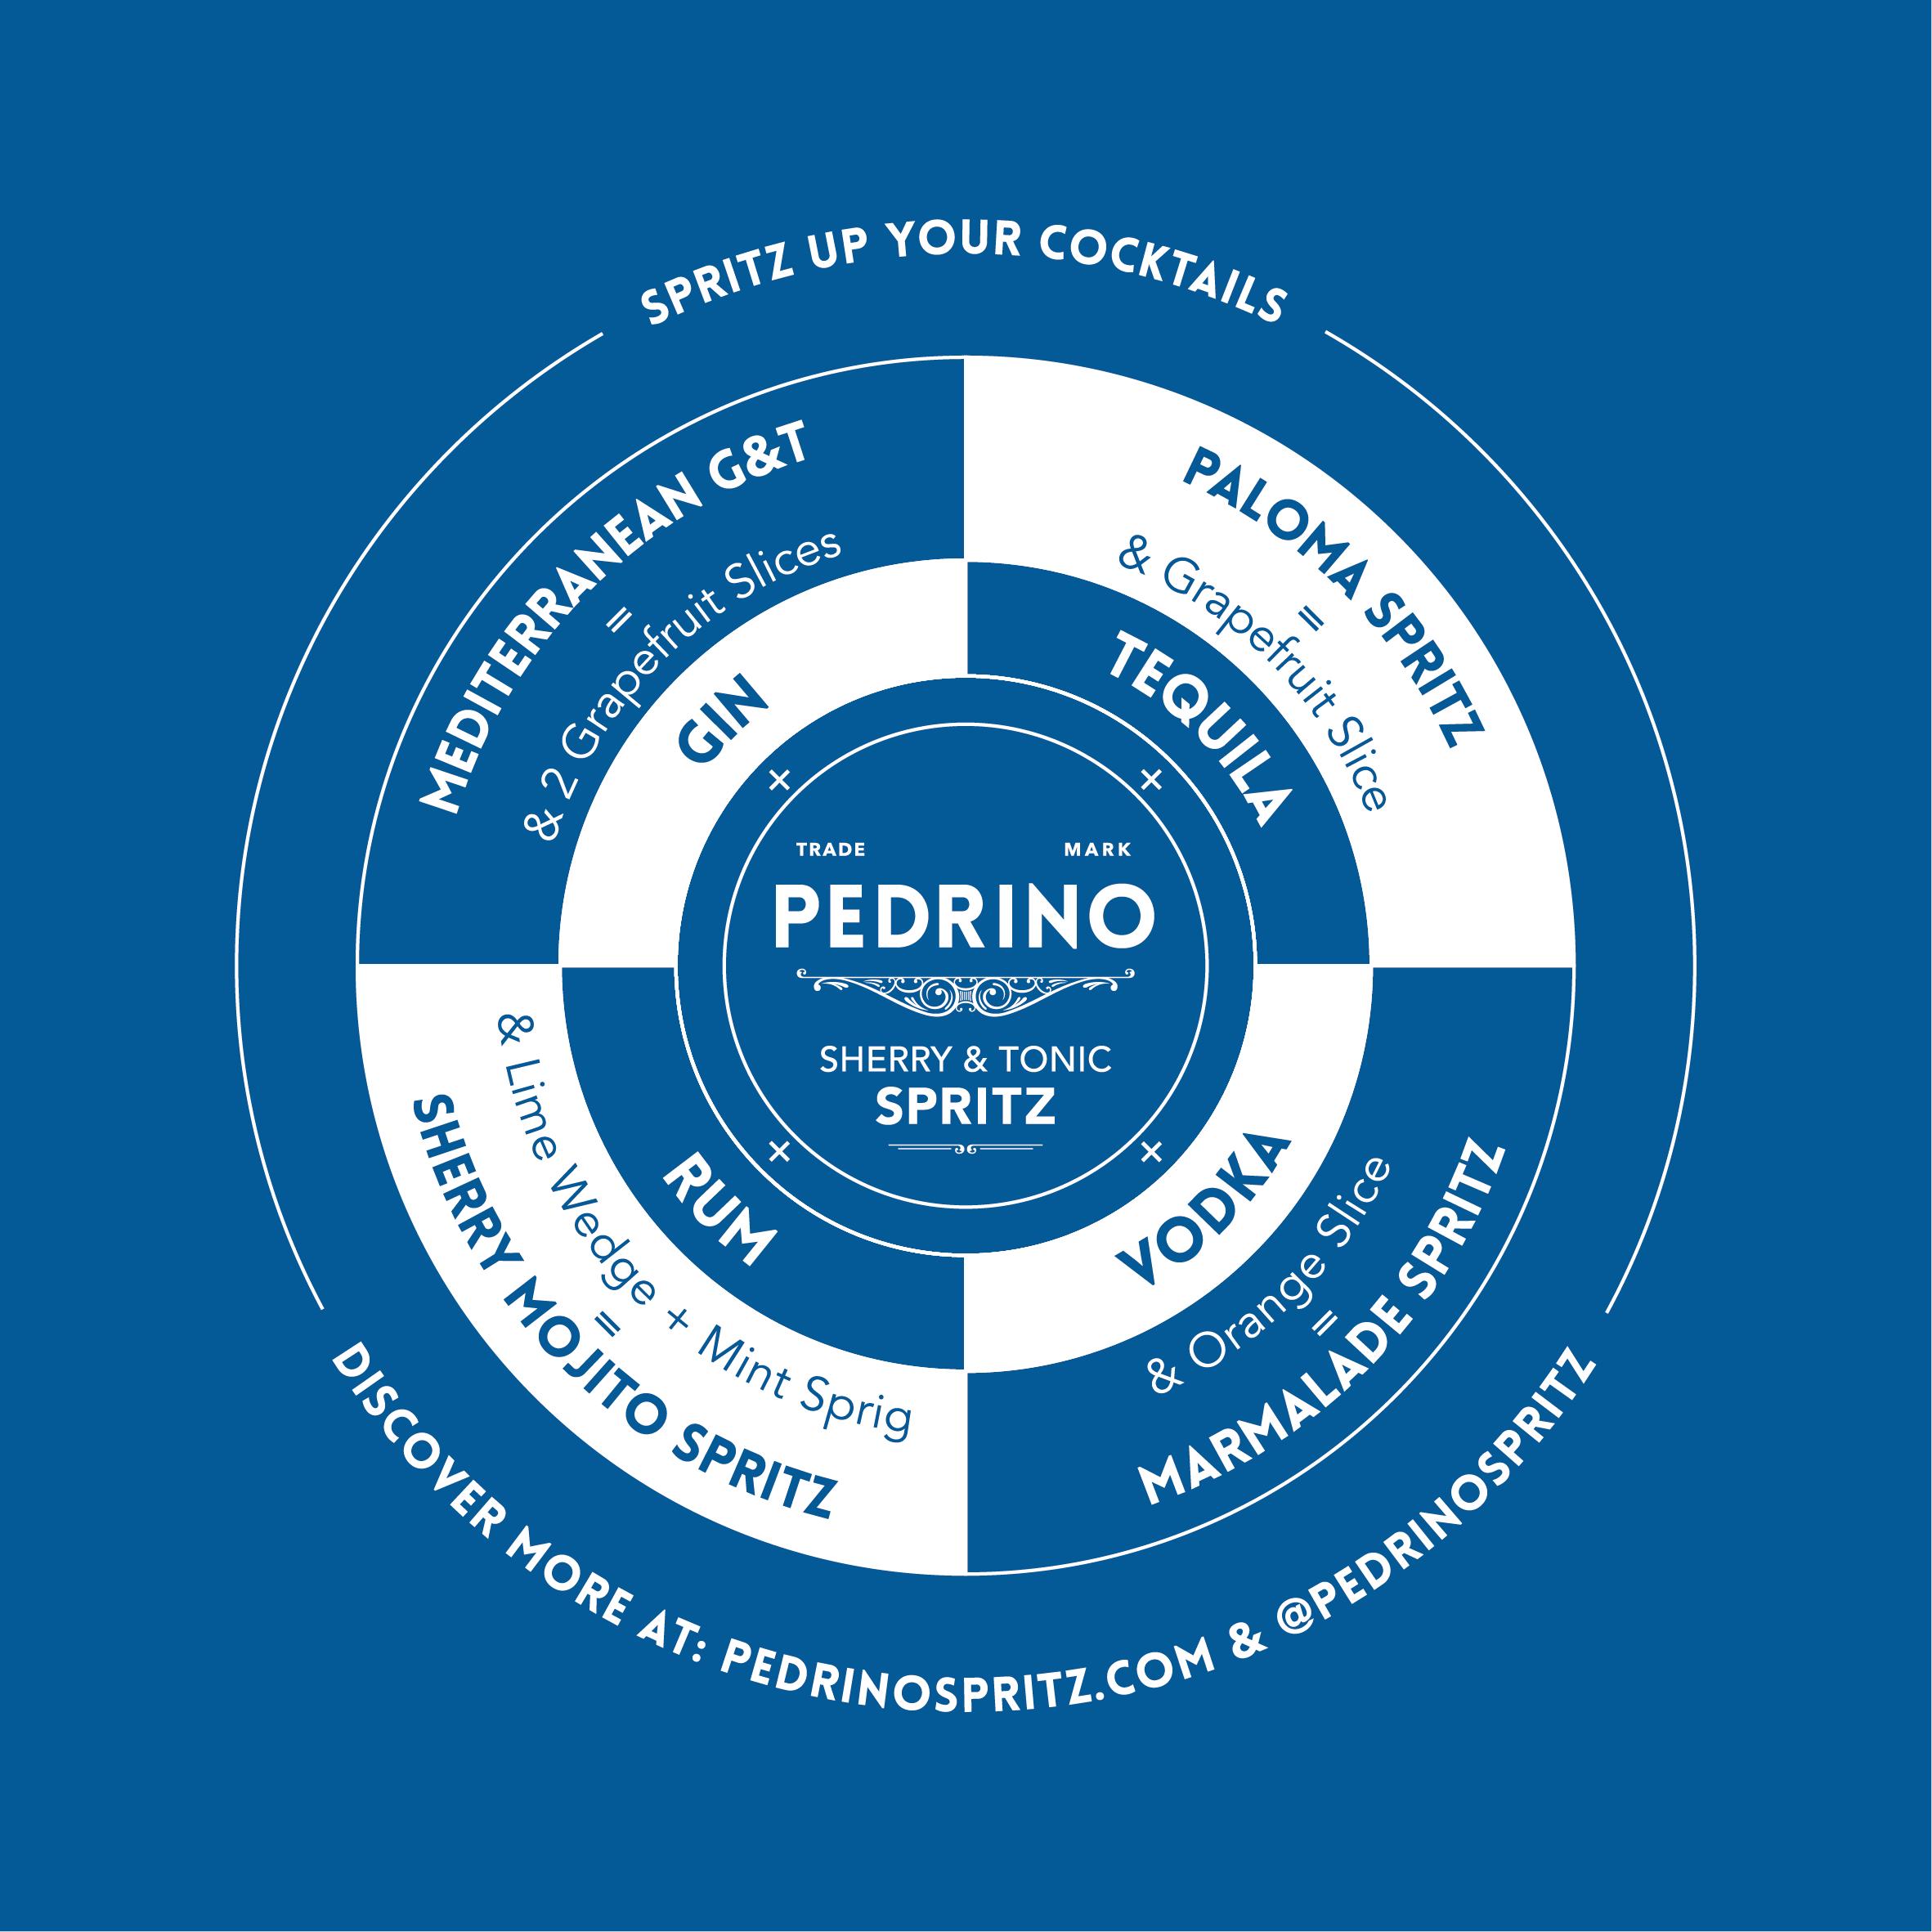 Pedrino Sherry & Tonic Spritz. Pairing Wheel